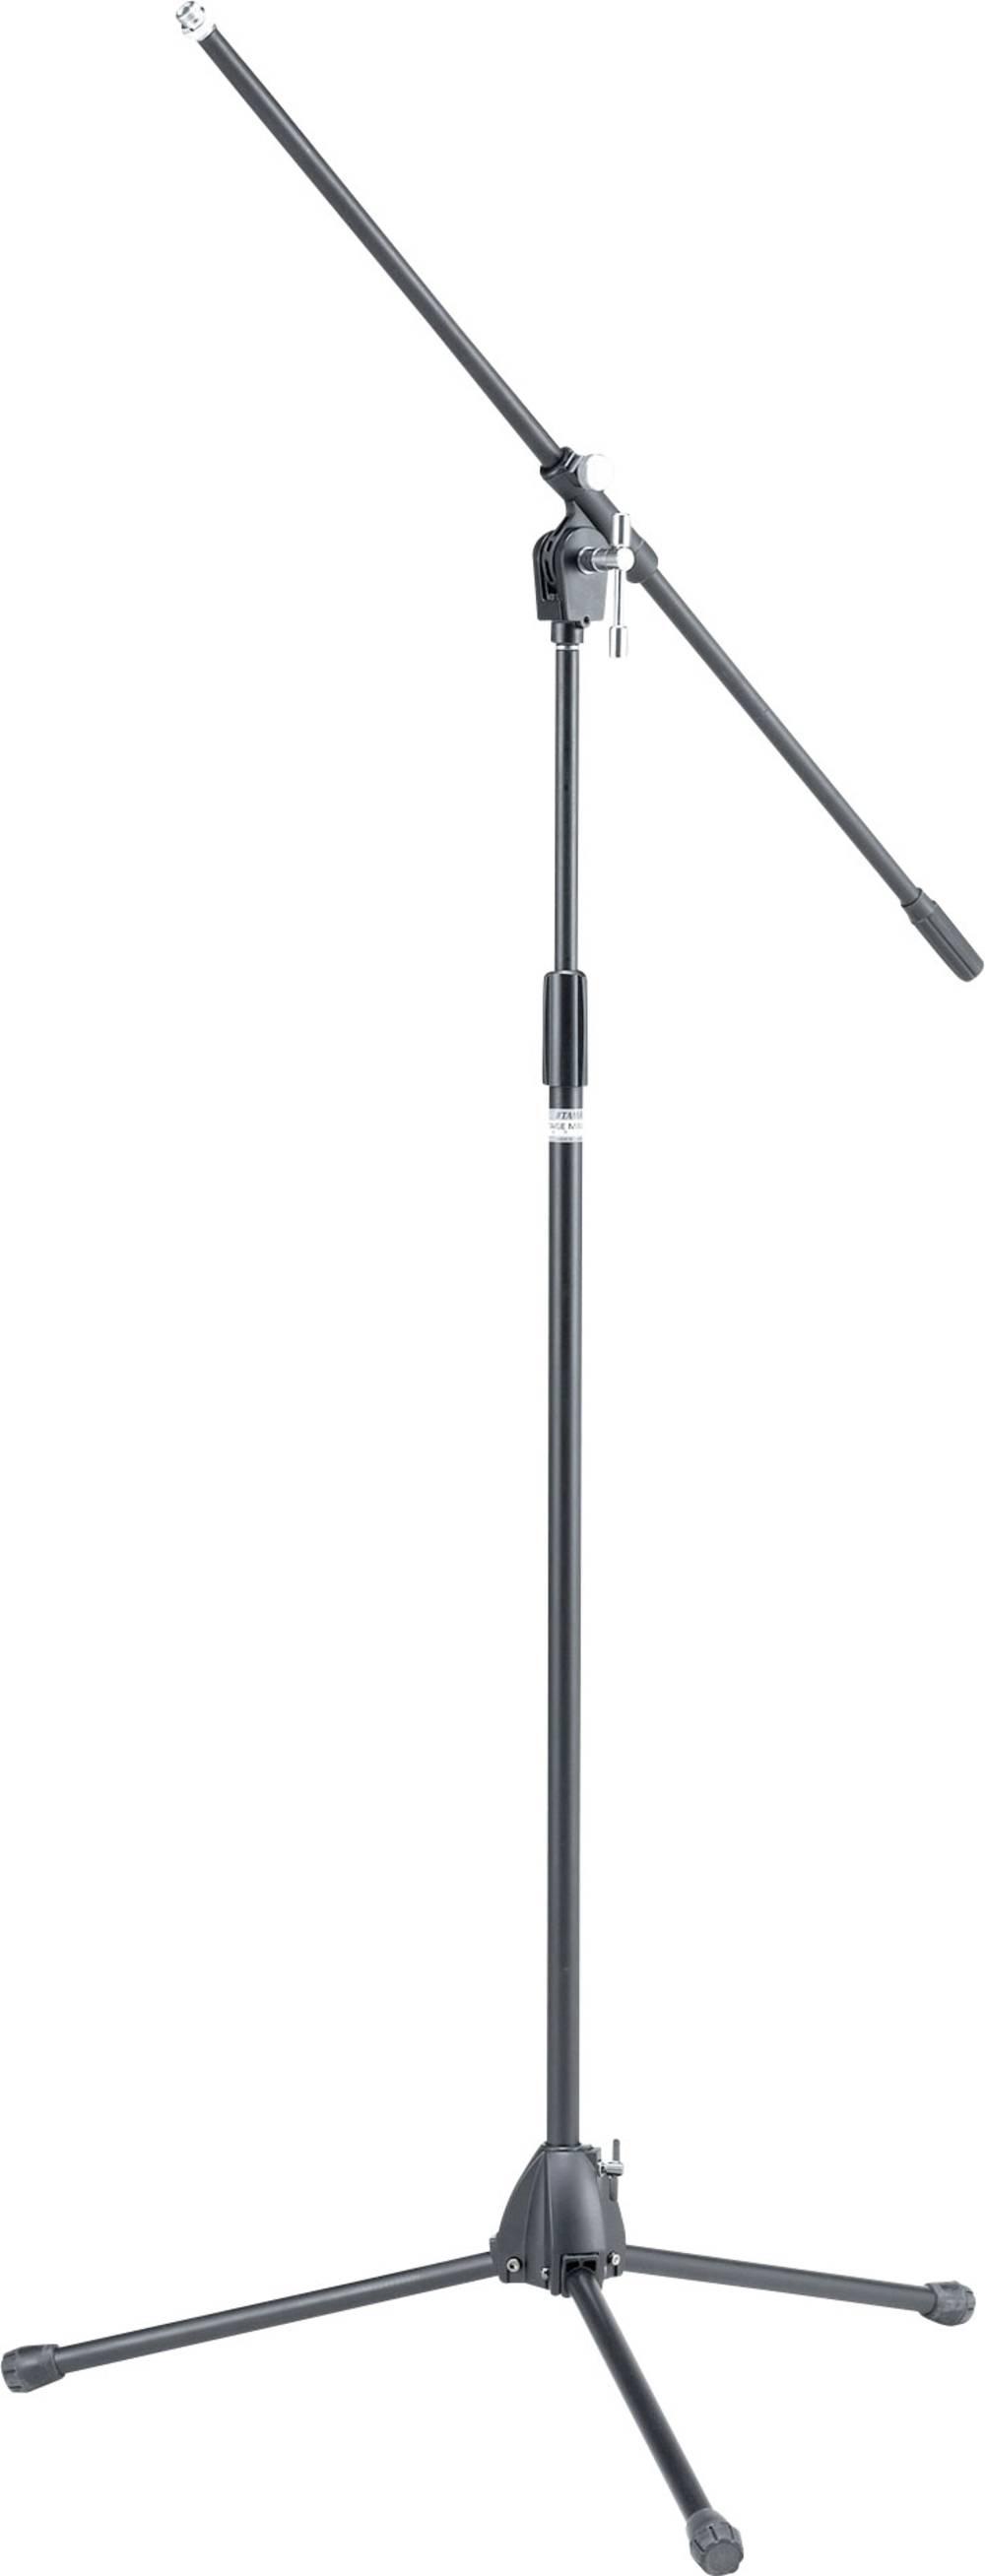 Stojalo za mikrofon Tama MS205-BK črn